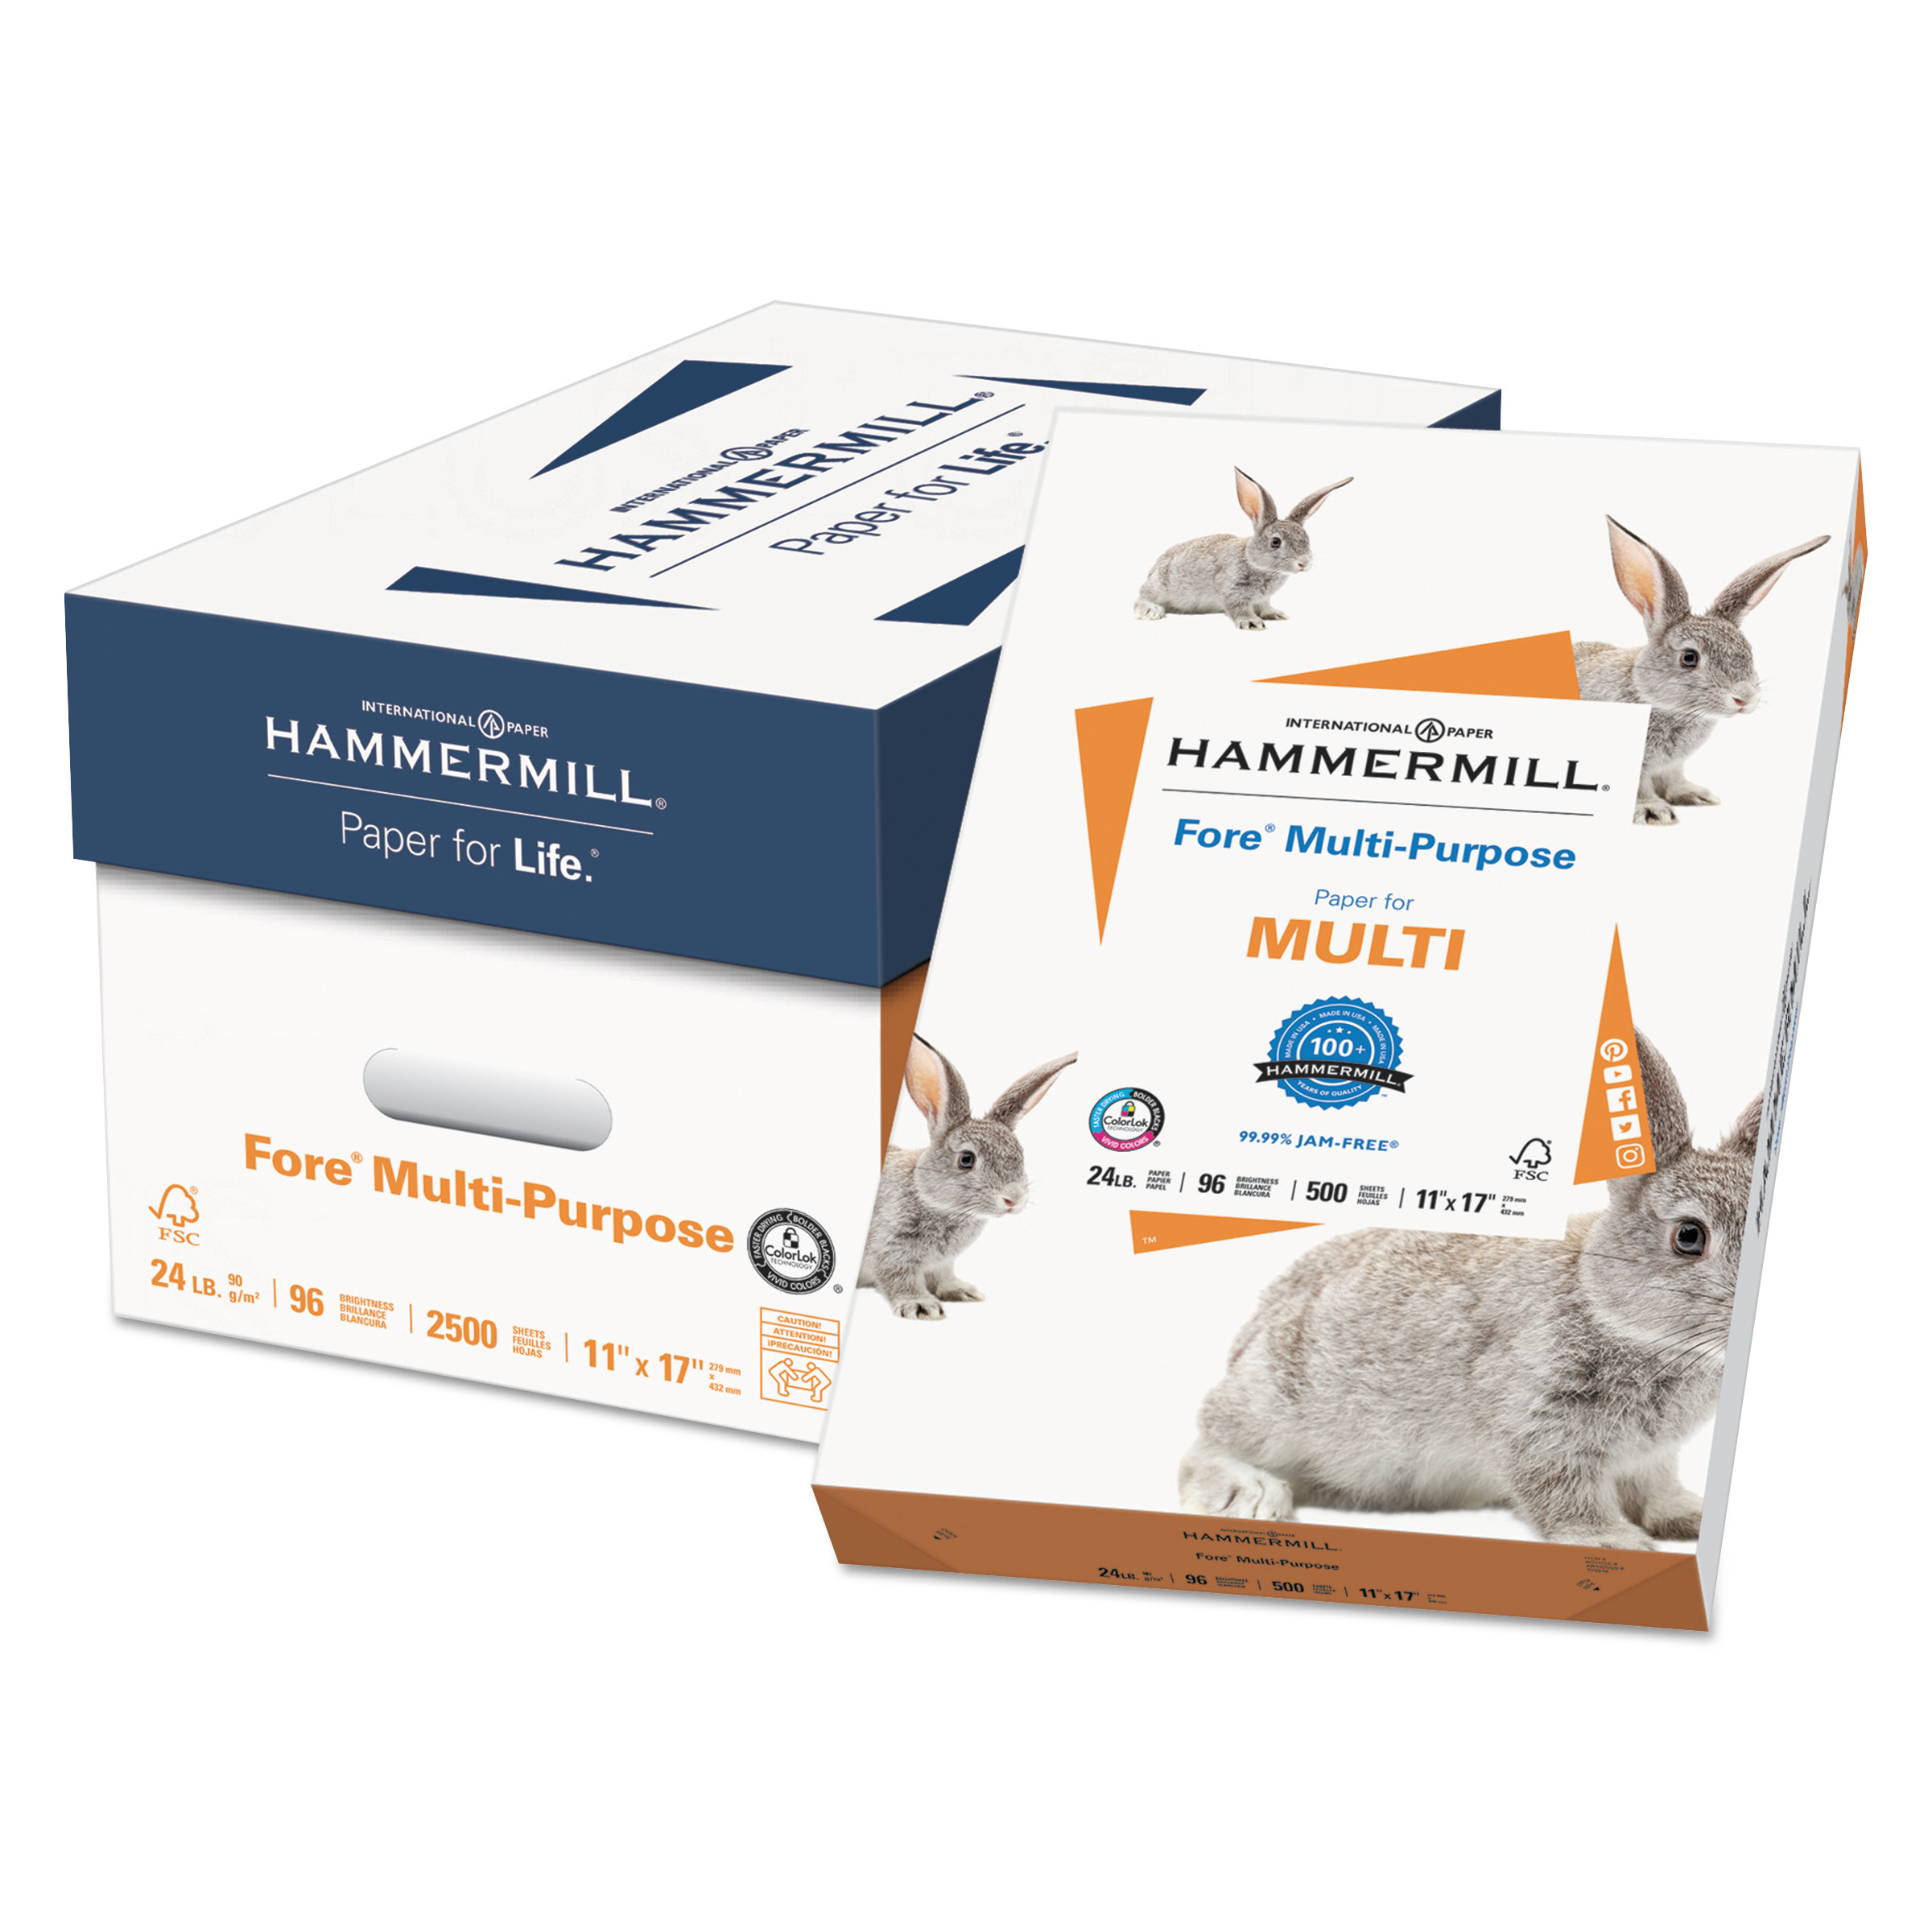 Hammermill Fore Multipurpose Paper, 96 Bright, 24lb, 11 x 17, White, 500 Sheets/Ream -HAM102848